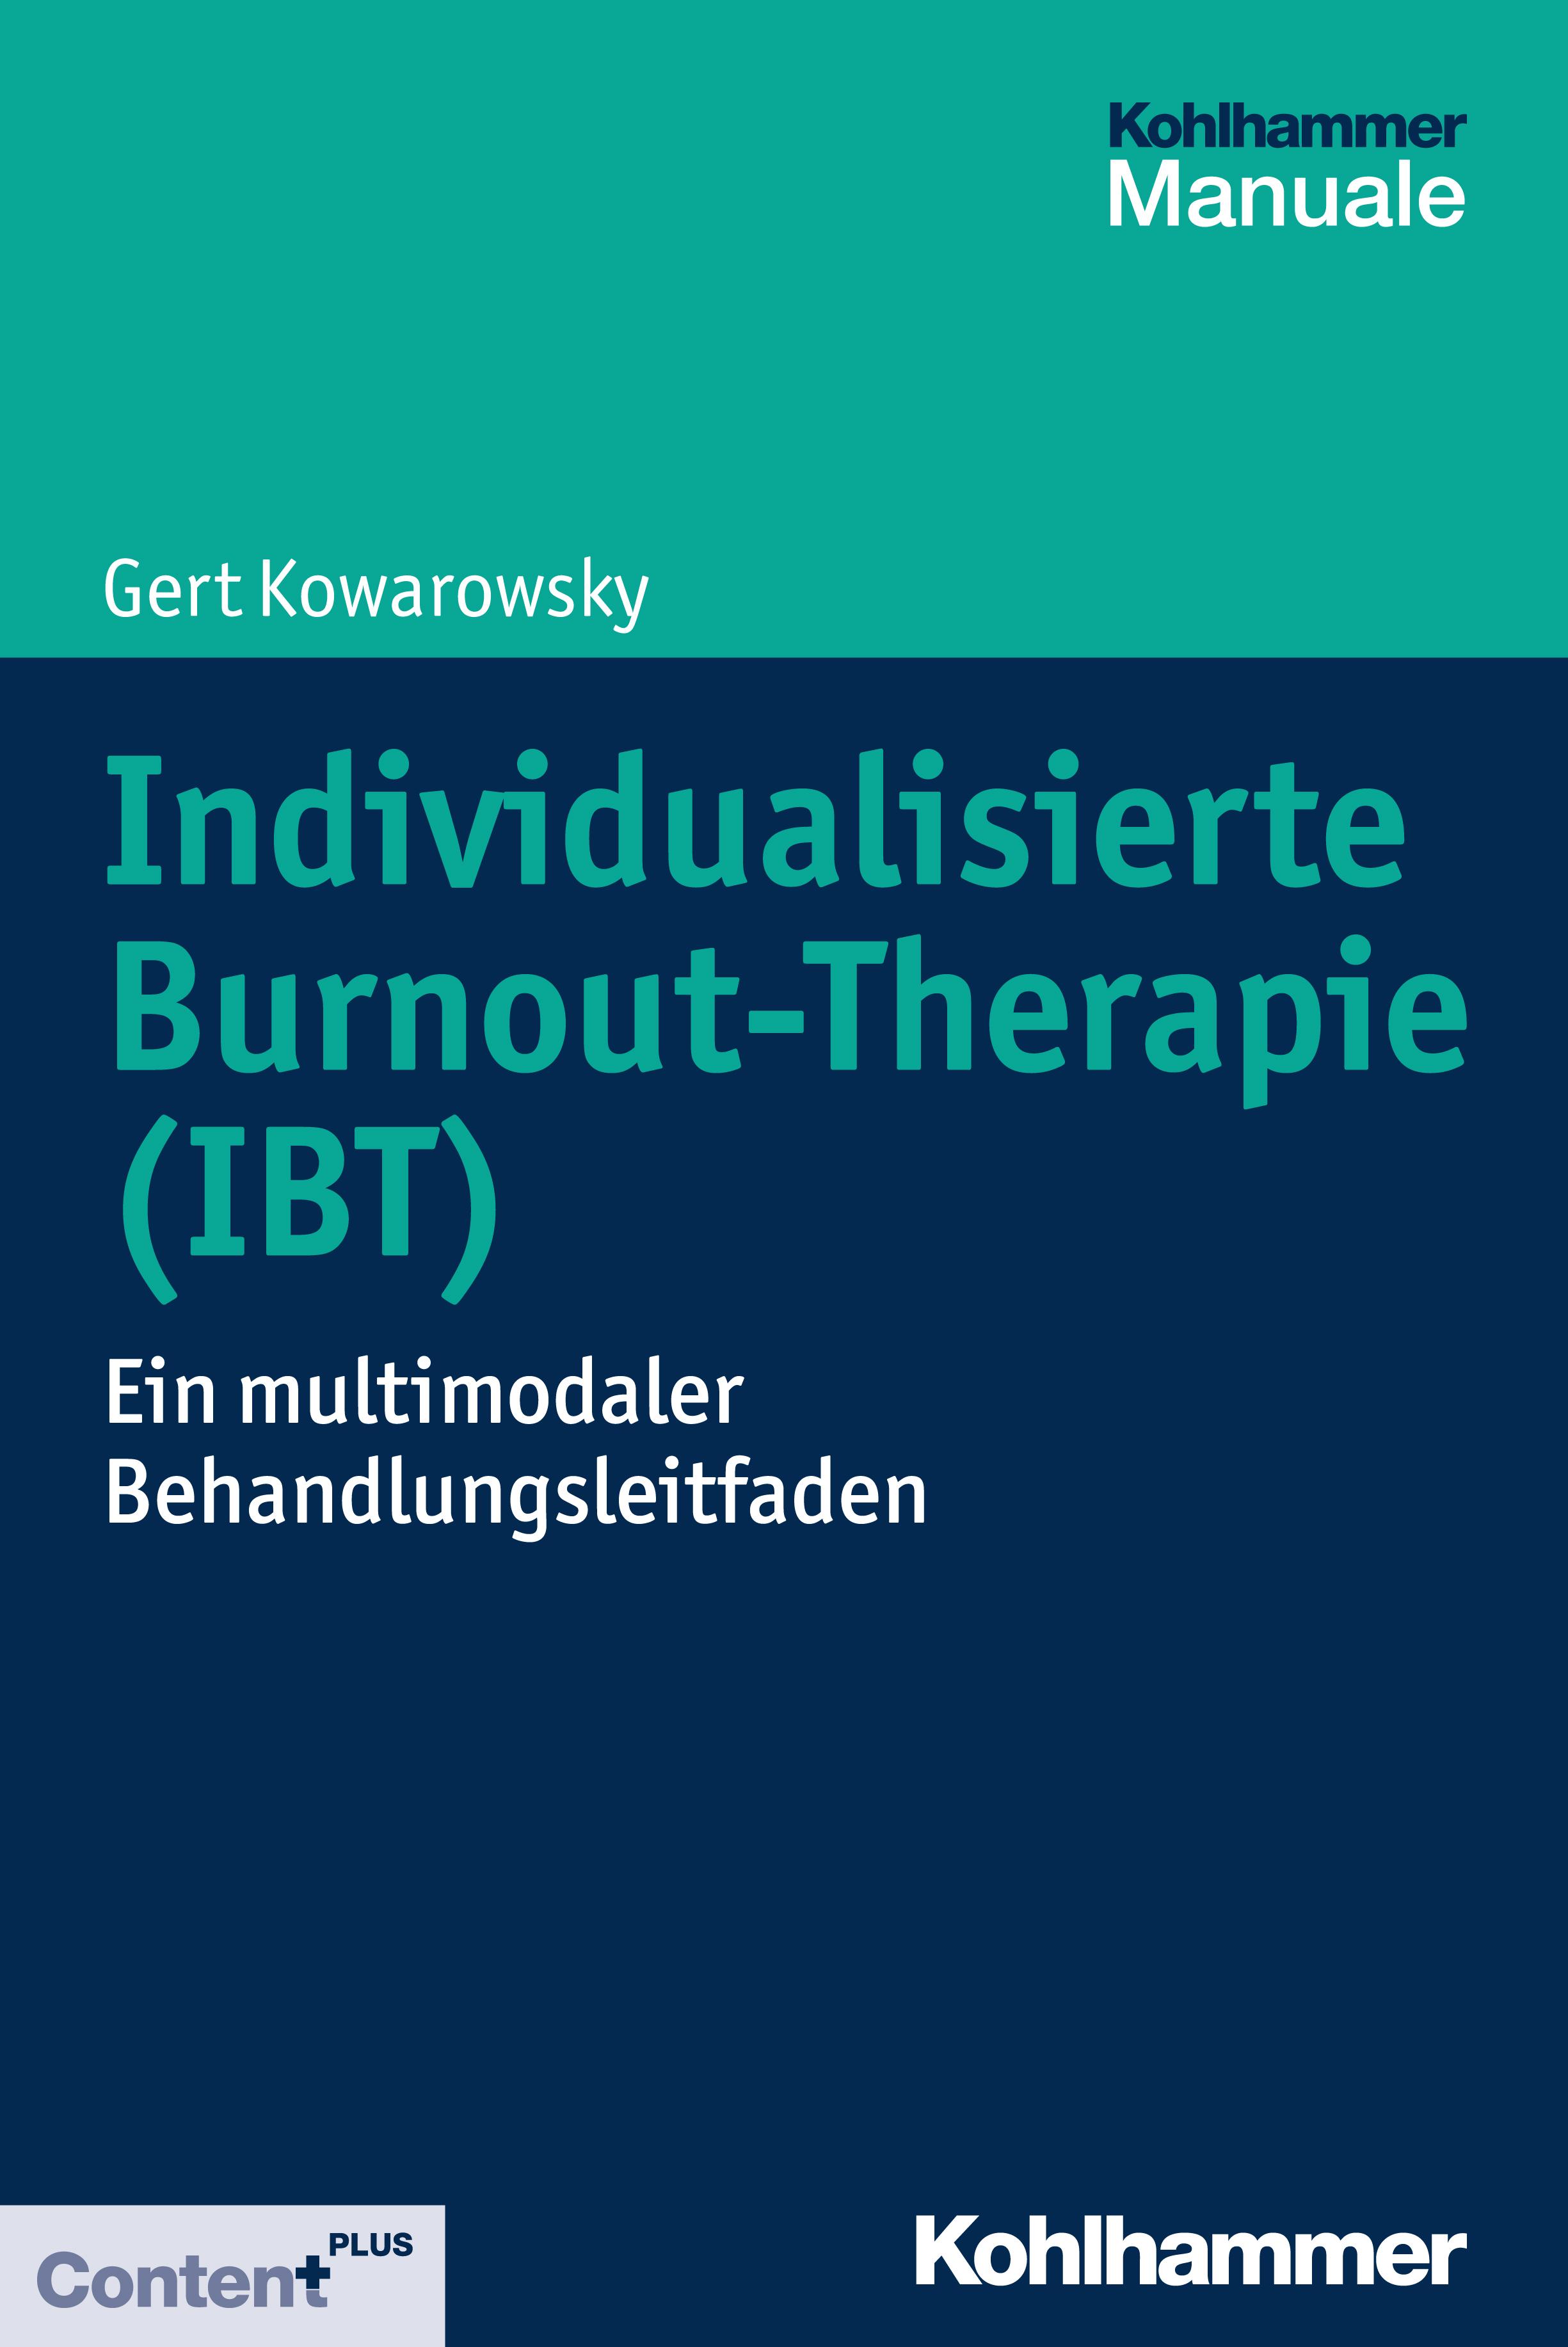 Gert Kowarowsky Individualisierte Burnout-Therapie (IBT) gert kowarowsky der schwierige patient